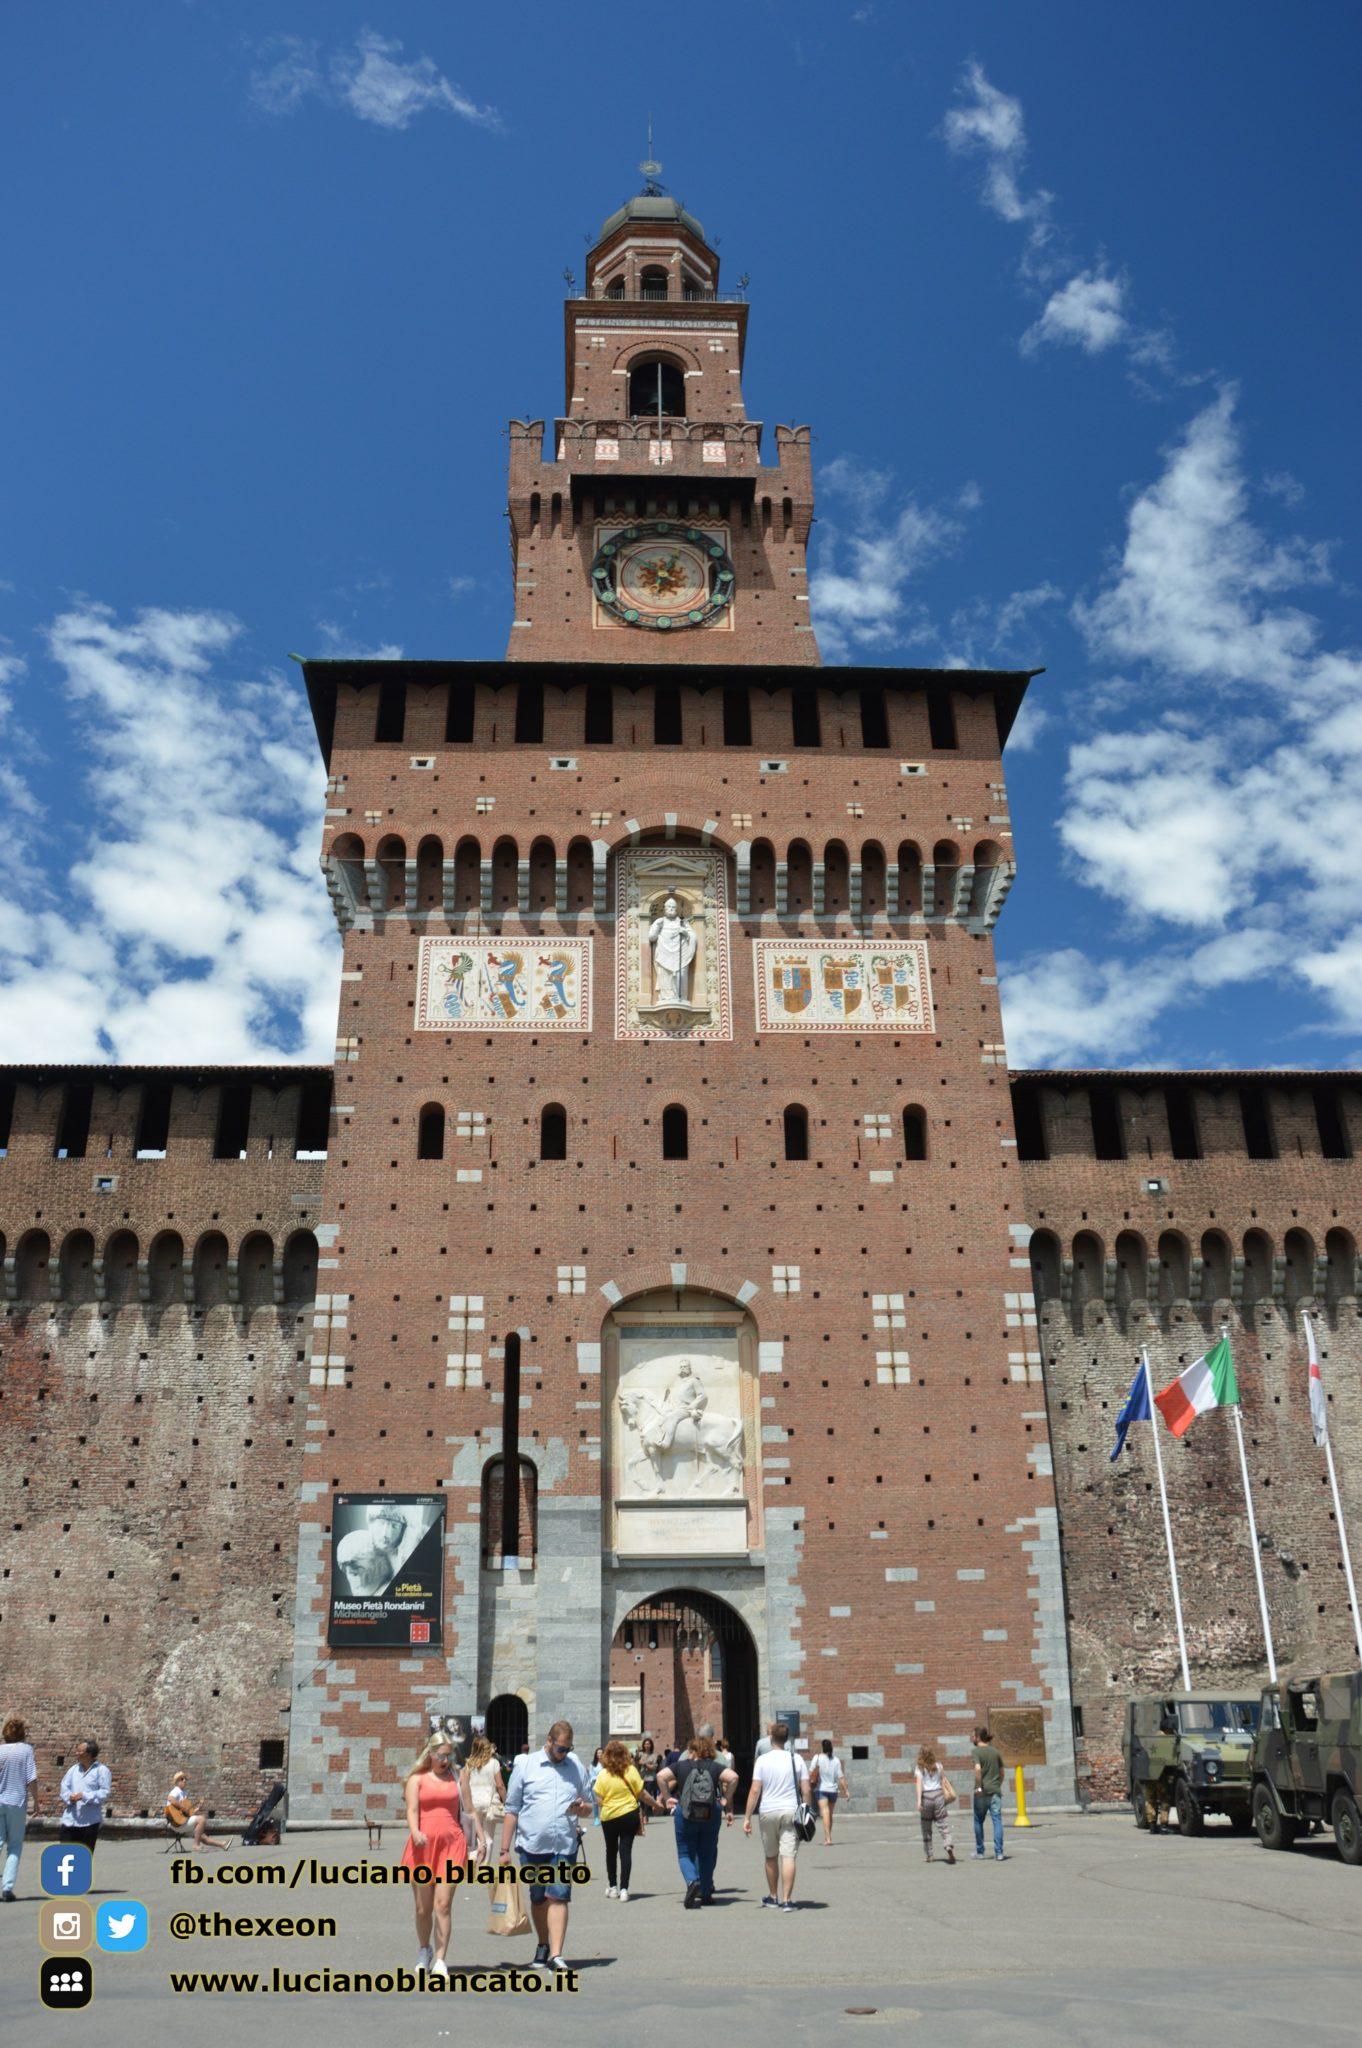 copy_Milano - Castello sforzesco